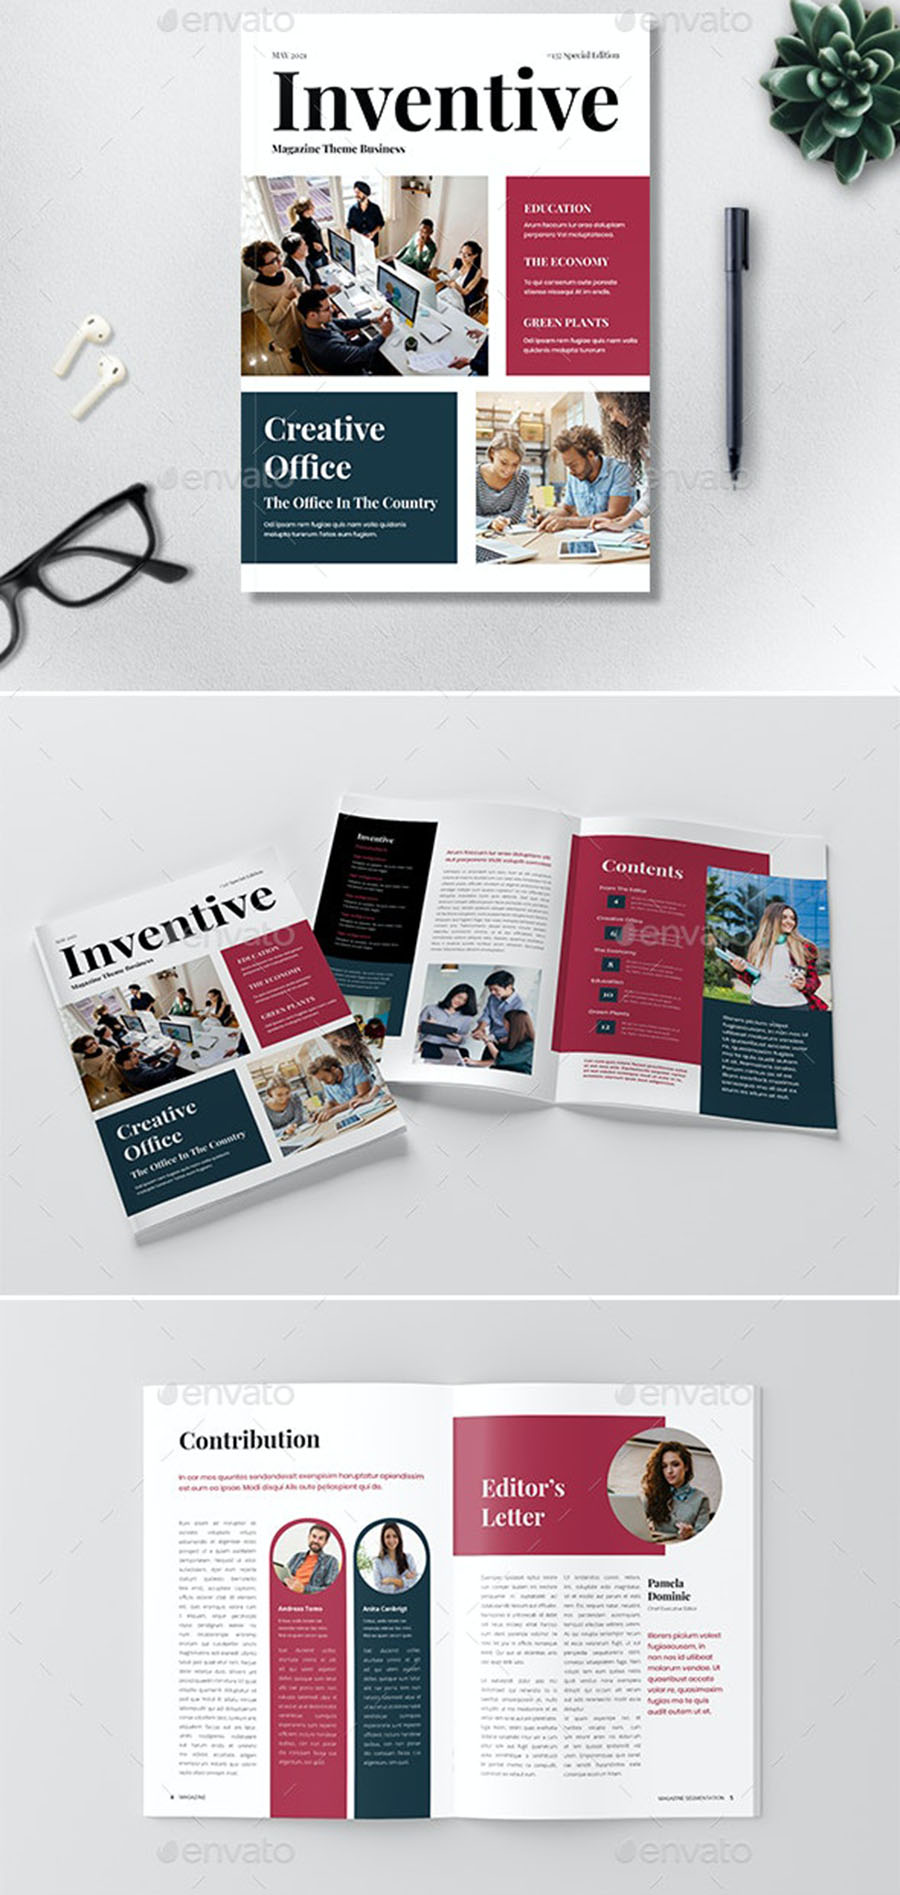 Inventive InDesign Magazine Template